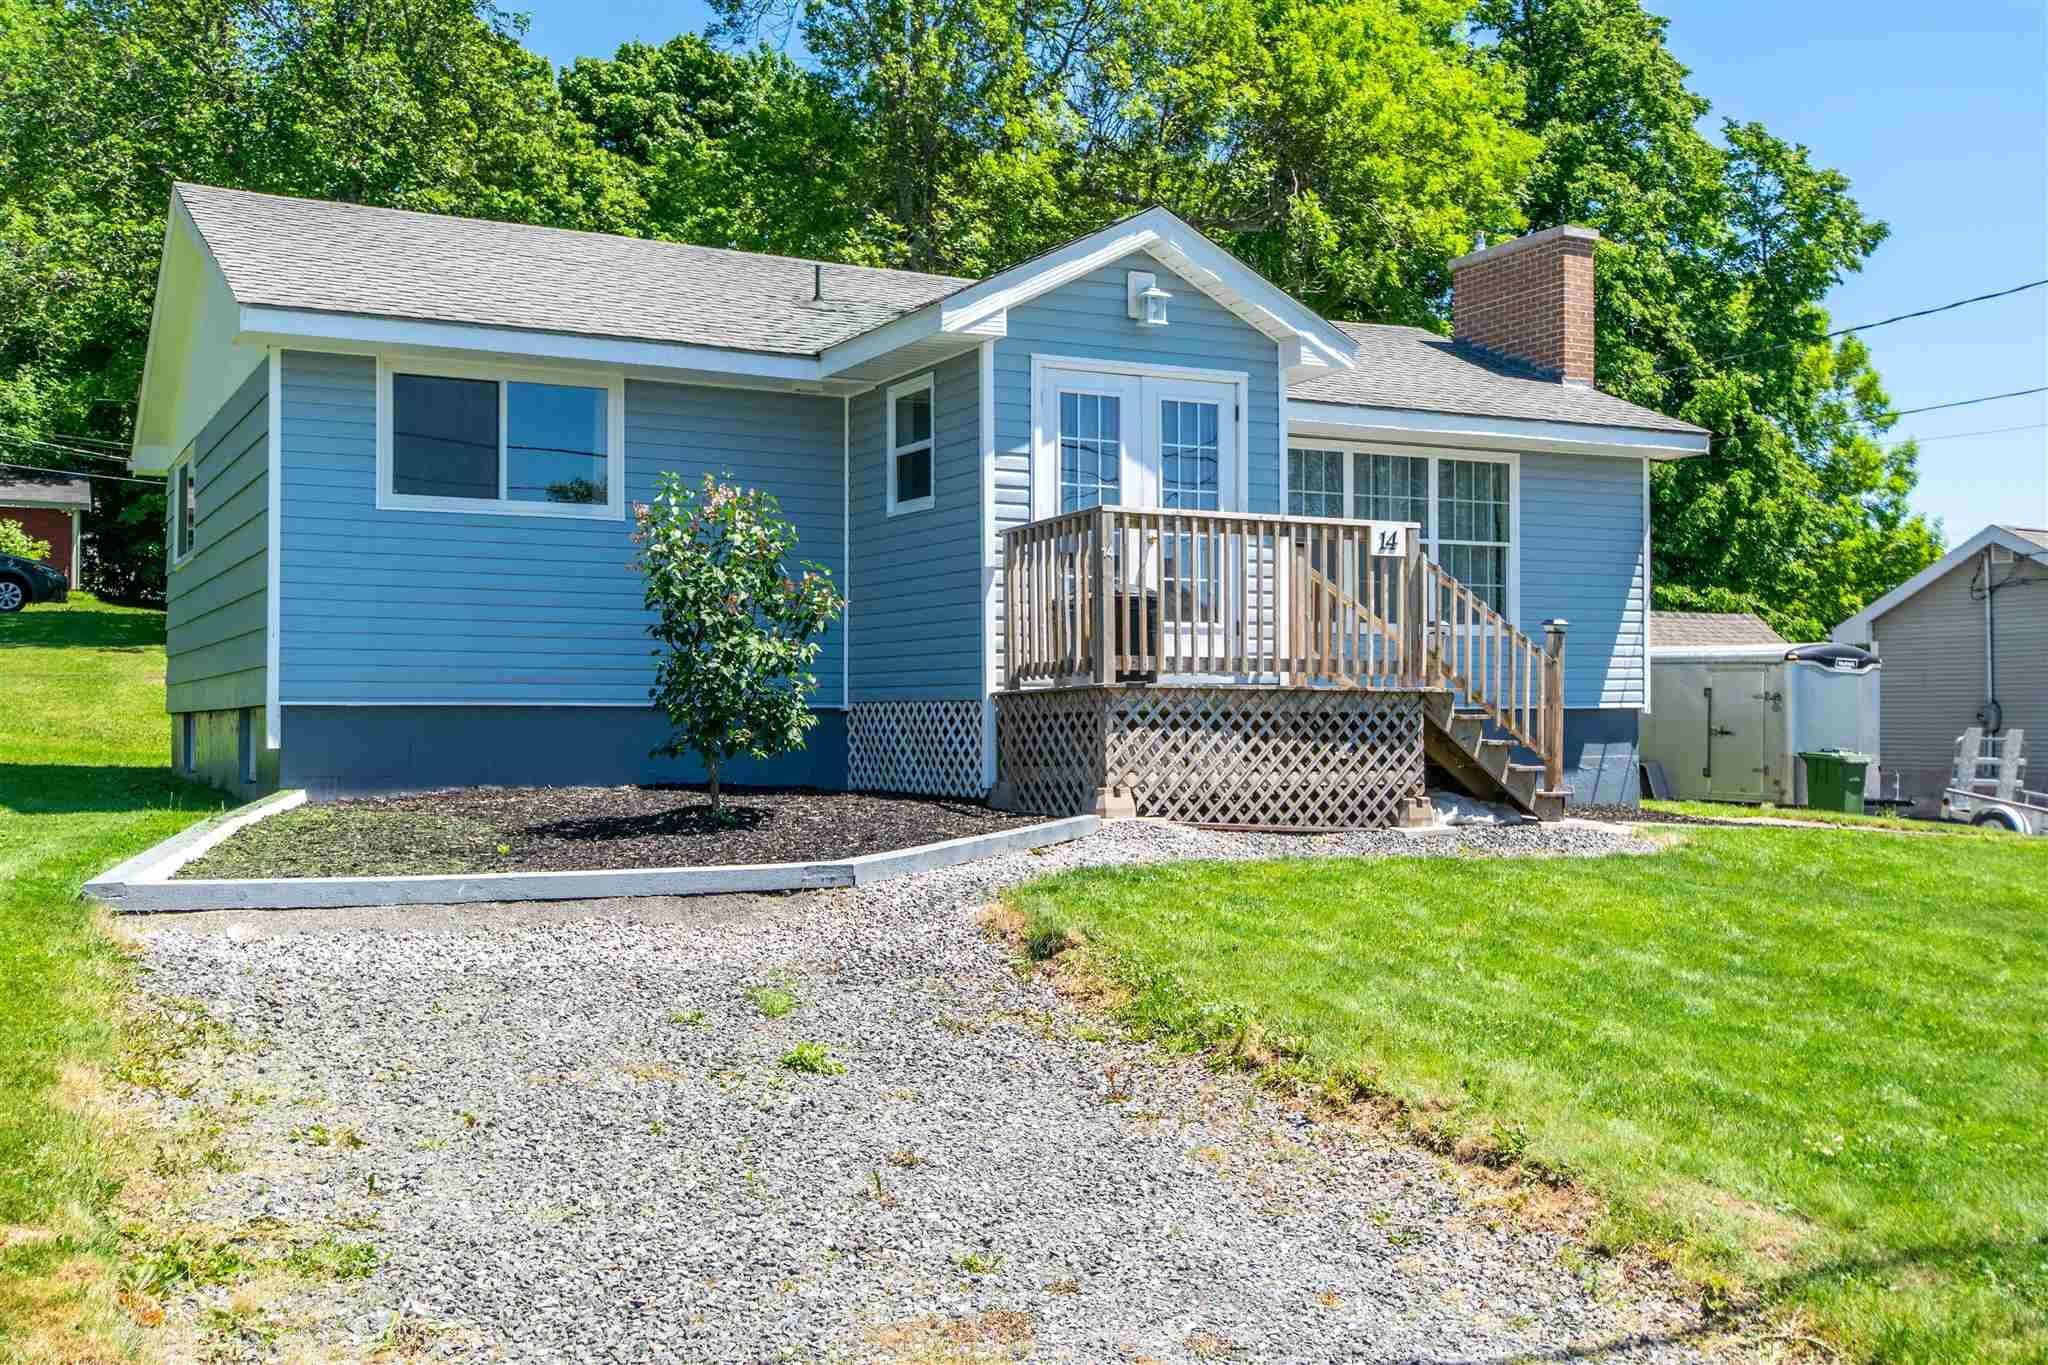 Main Photo: 14 Martha Street in Pictou: 107-Trenton,Westville,Pictou Residential for sale (Northern Region)  : MLS®# 202116642